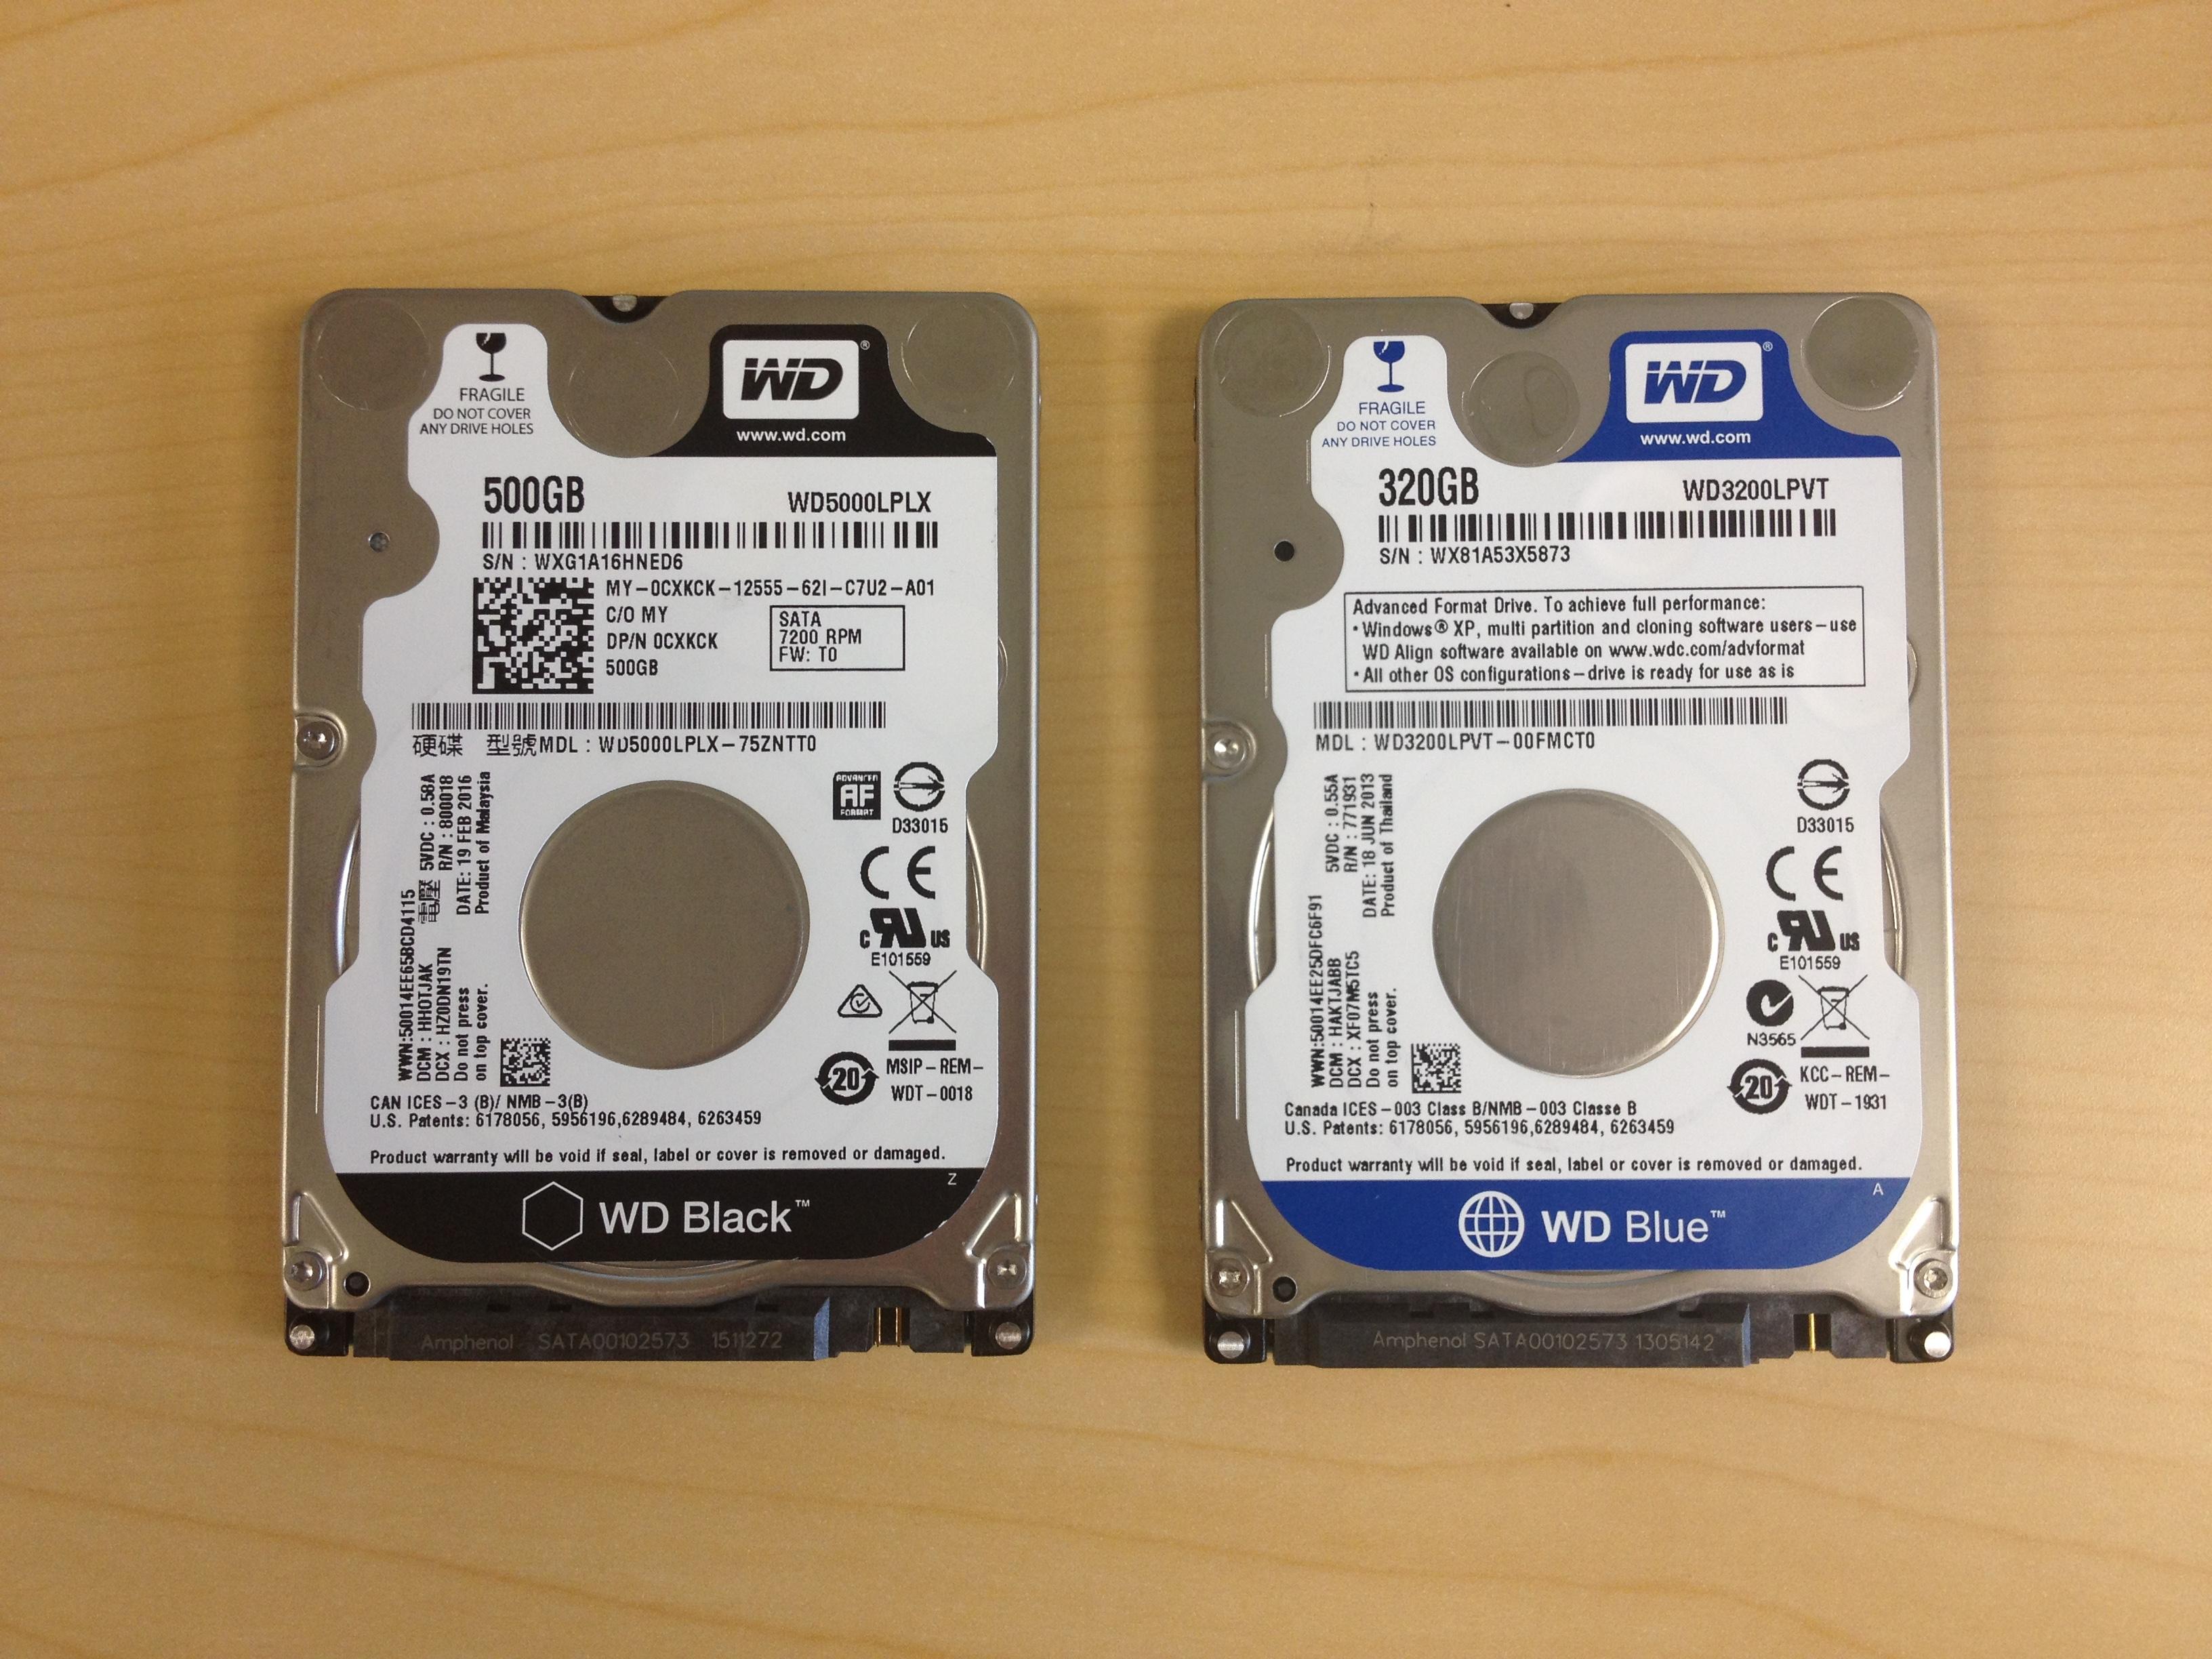 "Western Digital 2.5"" Laptop Hard Drives WD5000LPLX and WD3200LPVT"